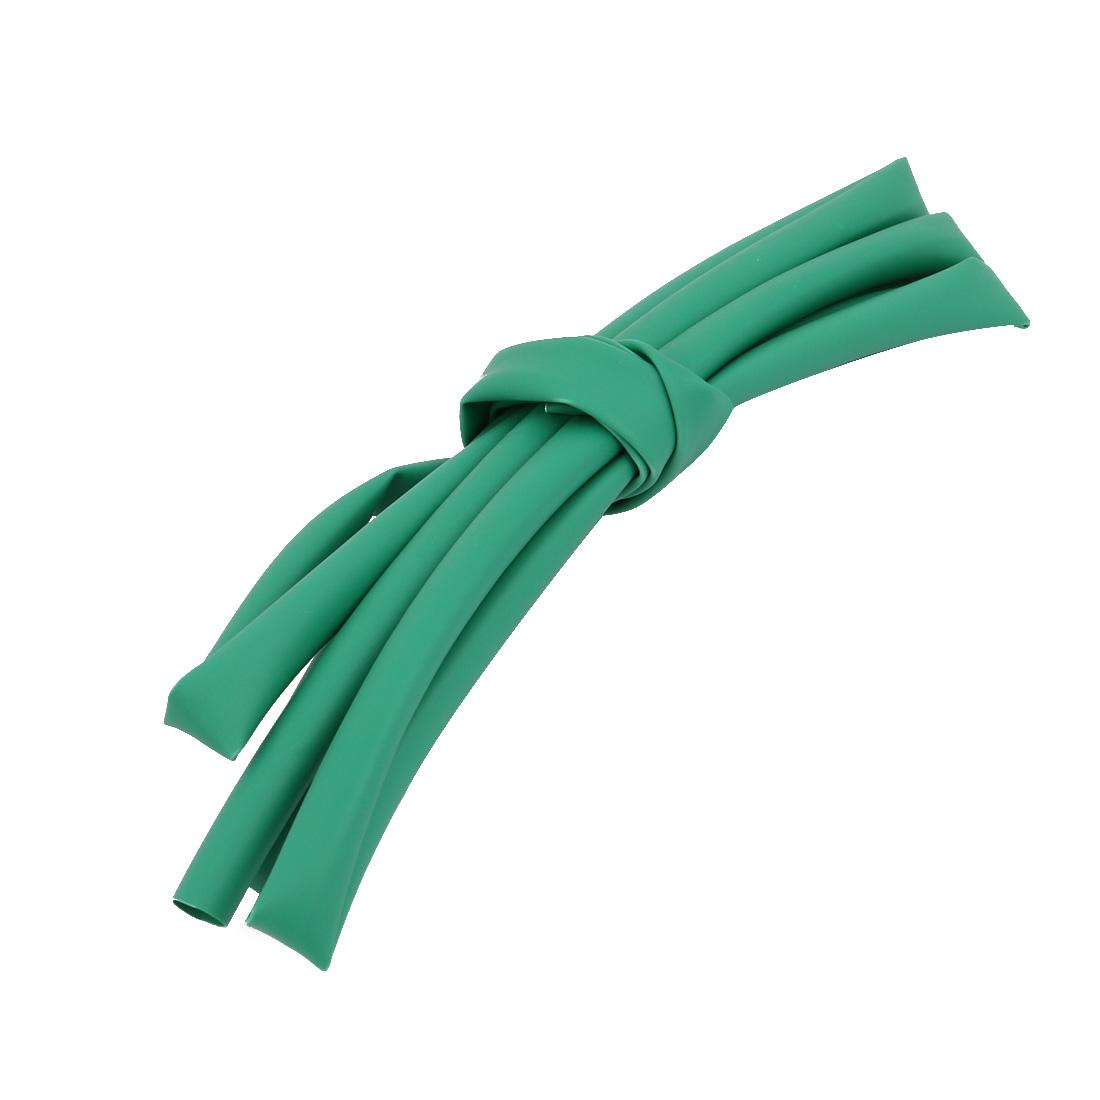 1M 0.2in Inner Dia Polyolefin Flame Retardant Tube Green for Wire Repairing